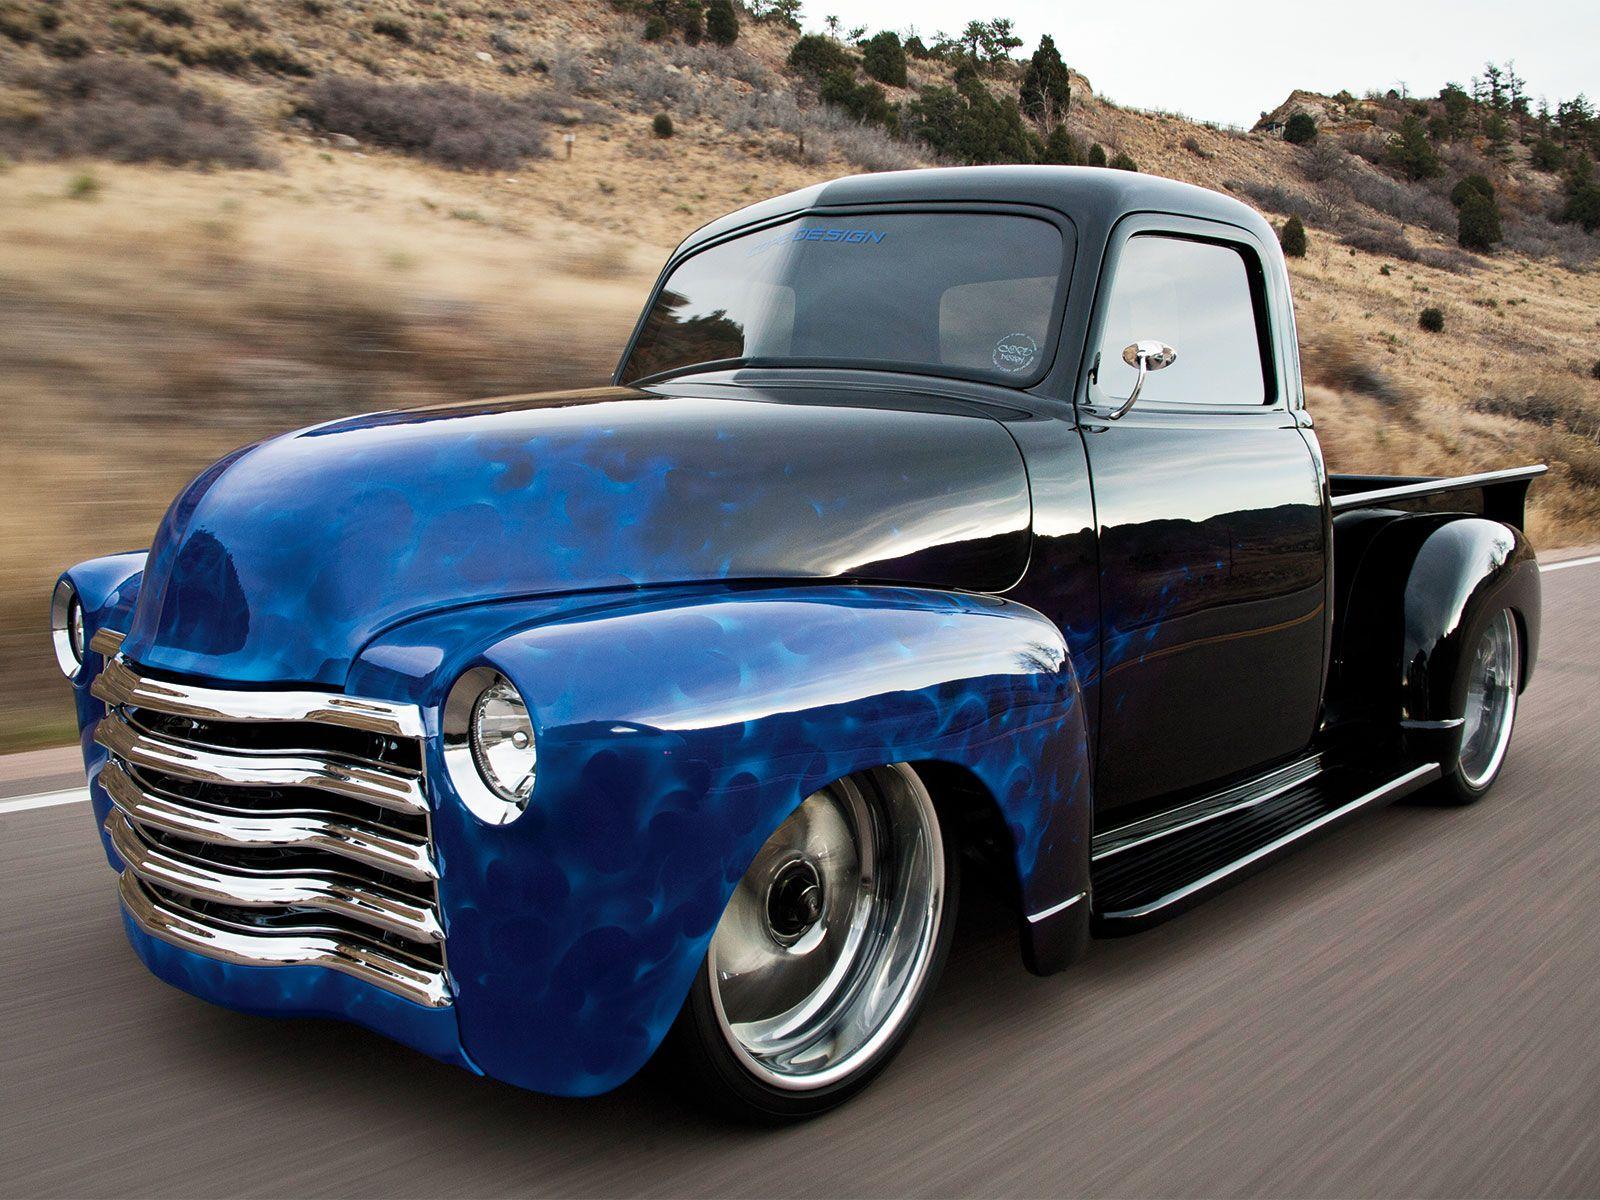 1951 Chevrolet Pickup Chevy Trucks 54 Chevy Truck 1951 Chevy Truck